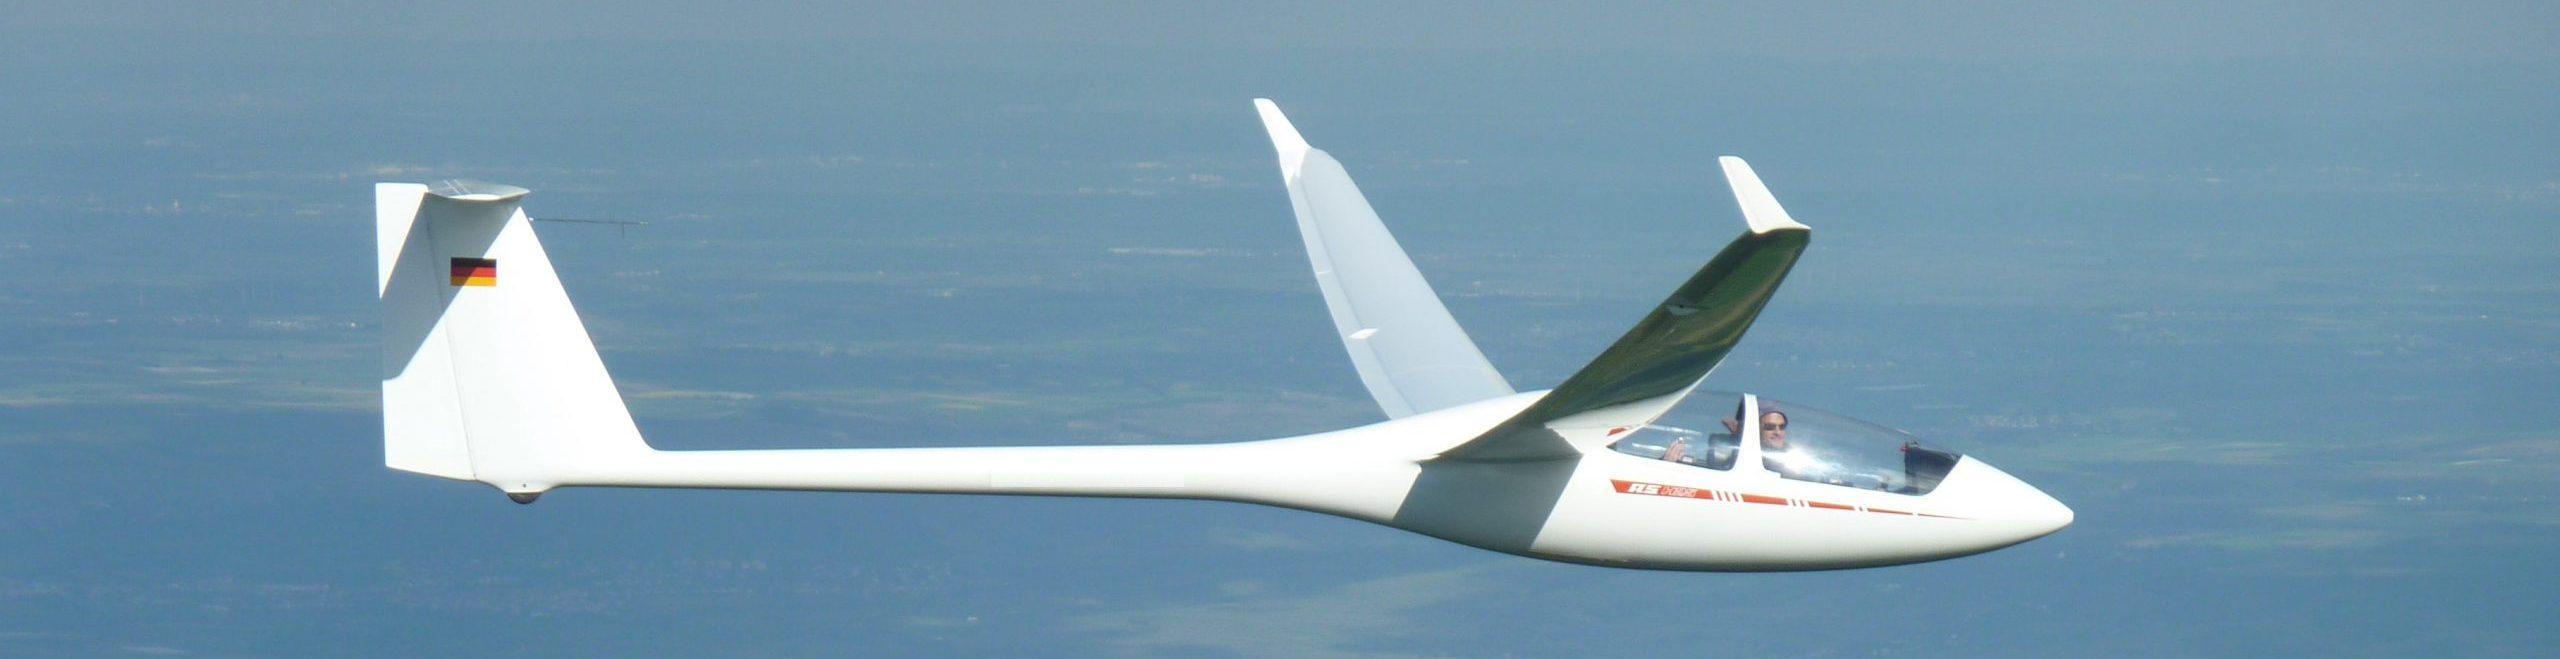 Photo eines Segelflugzeugs im Flug